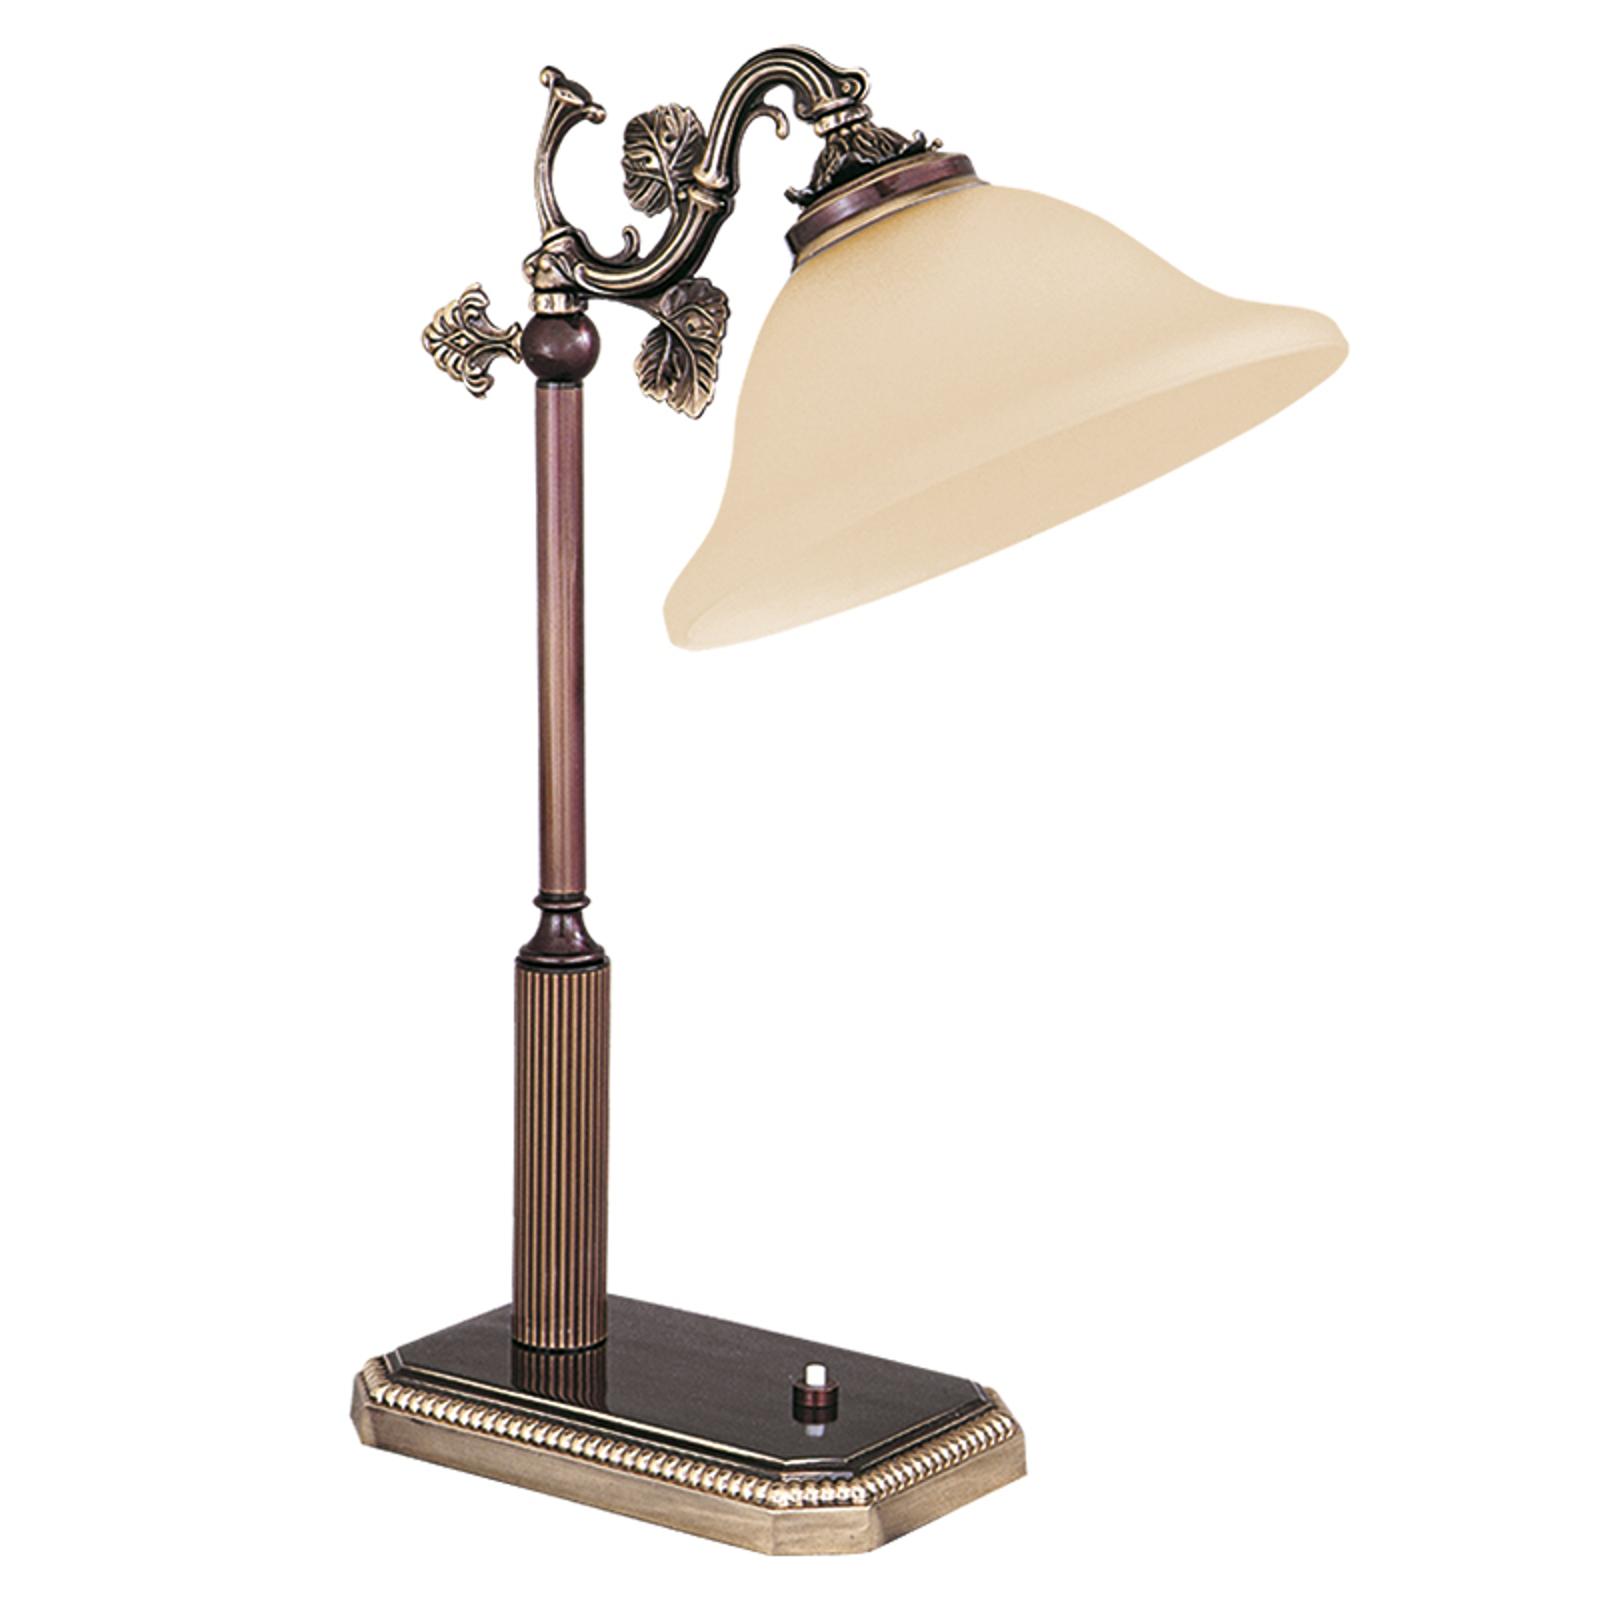 Smuk bordlampe fra RIALTO-serien rav